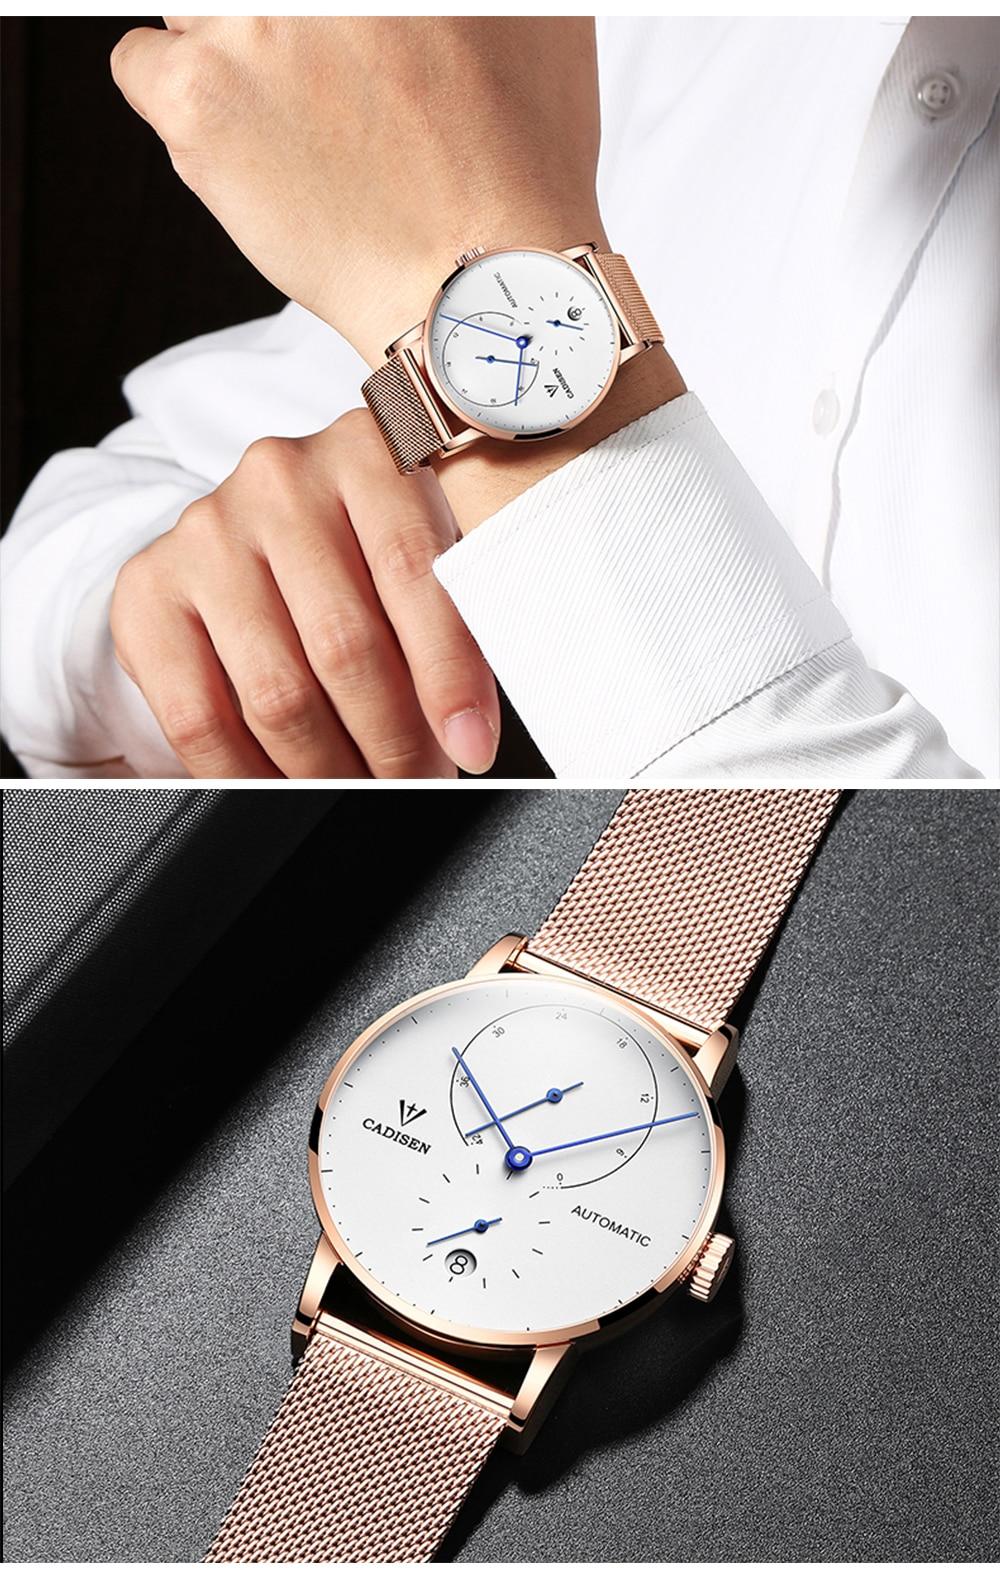 HTB1jl.VkyAnBKNjSZFvq6yTKXXaT Mens Watches CADISEN 2019 Top Luxury Brand Automatic Mechanical Watch Men Full Steel Business Waterproof Fashion Sport Watches